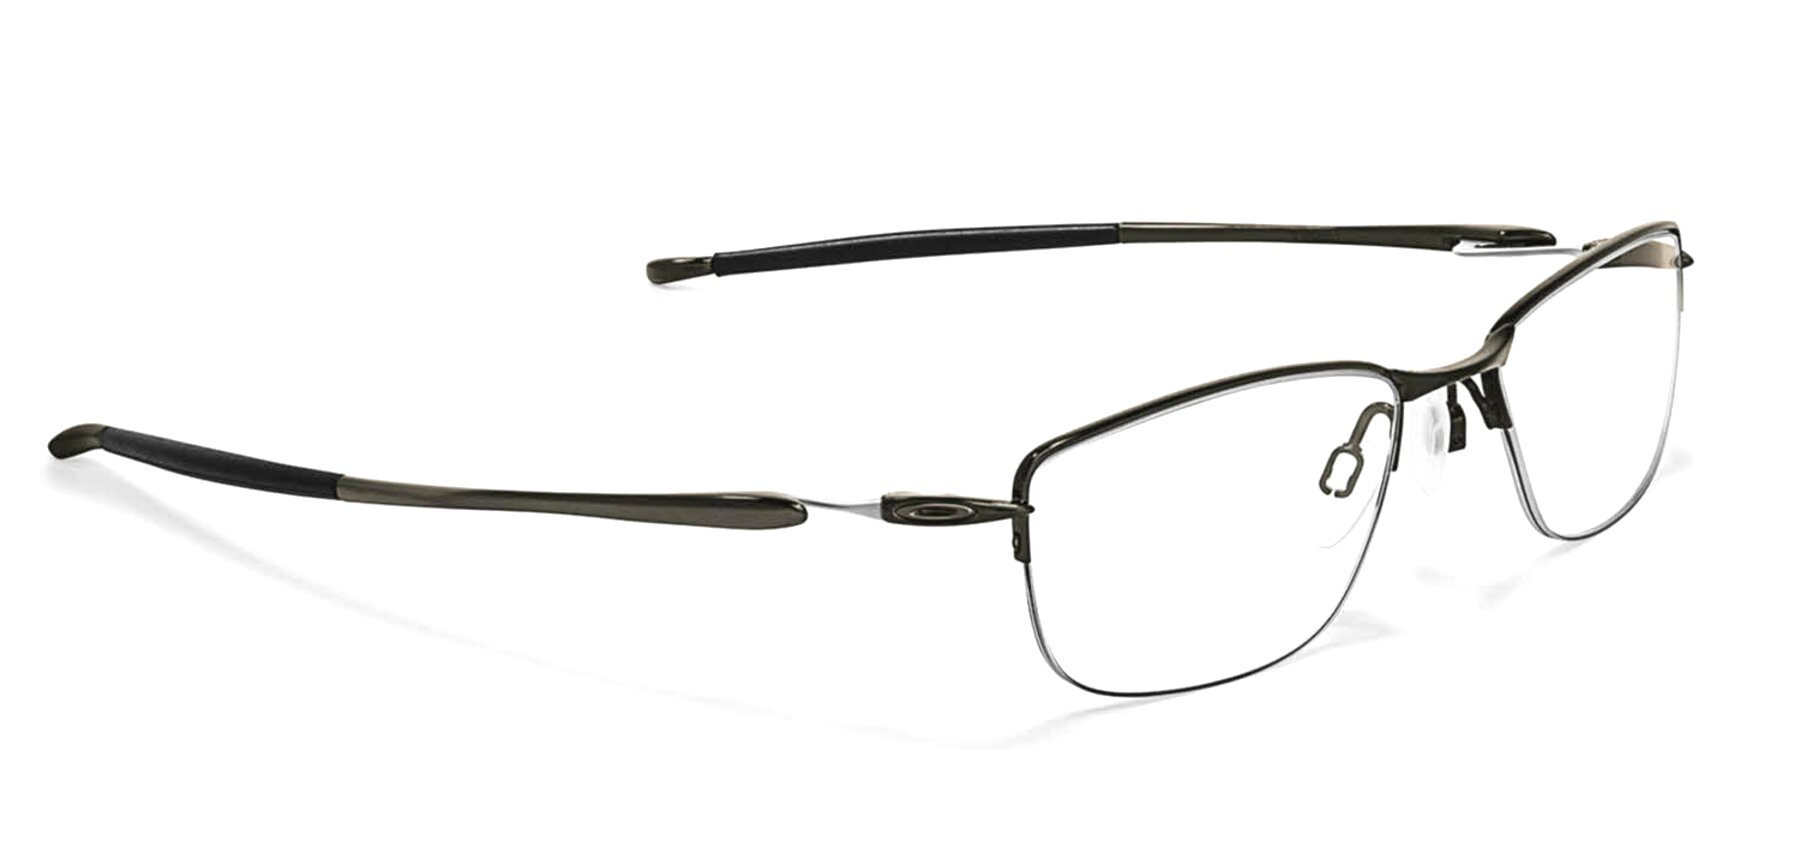 oakley eyeglasses for sale